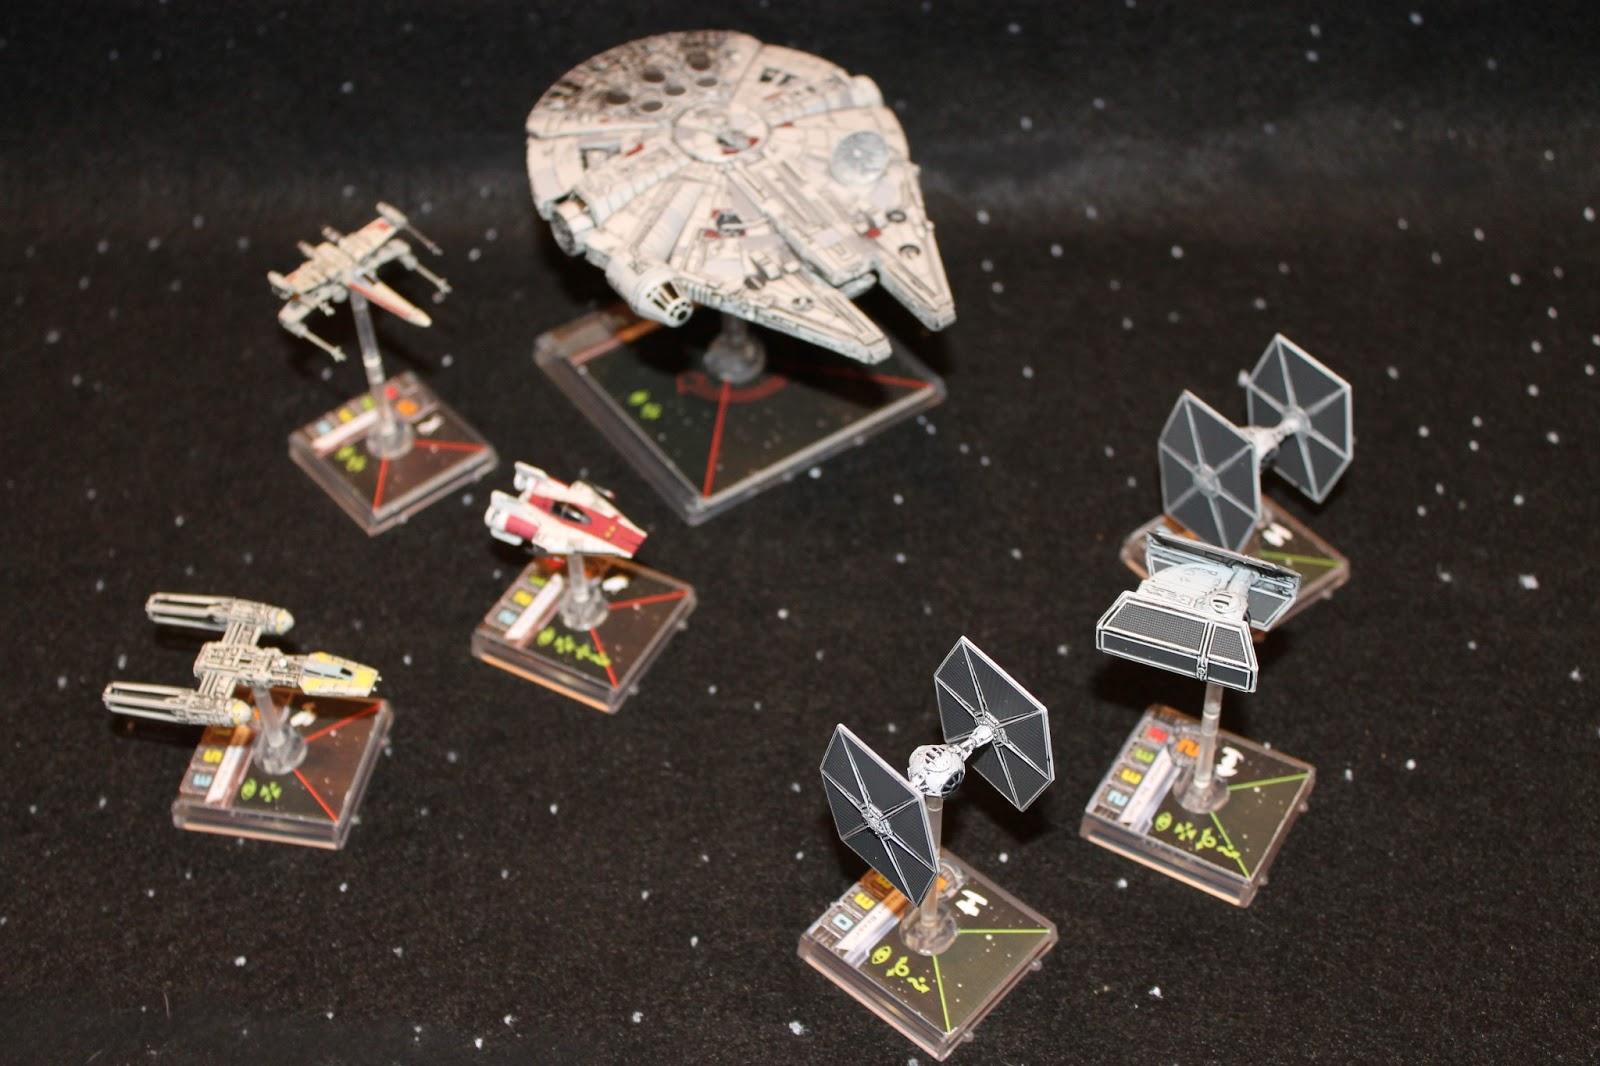 Uncategorized Luke Skywalker Ship themetalbikini com x wing miniatures and more crew members luke skywalker